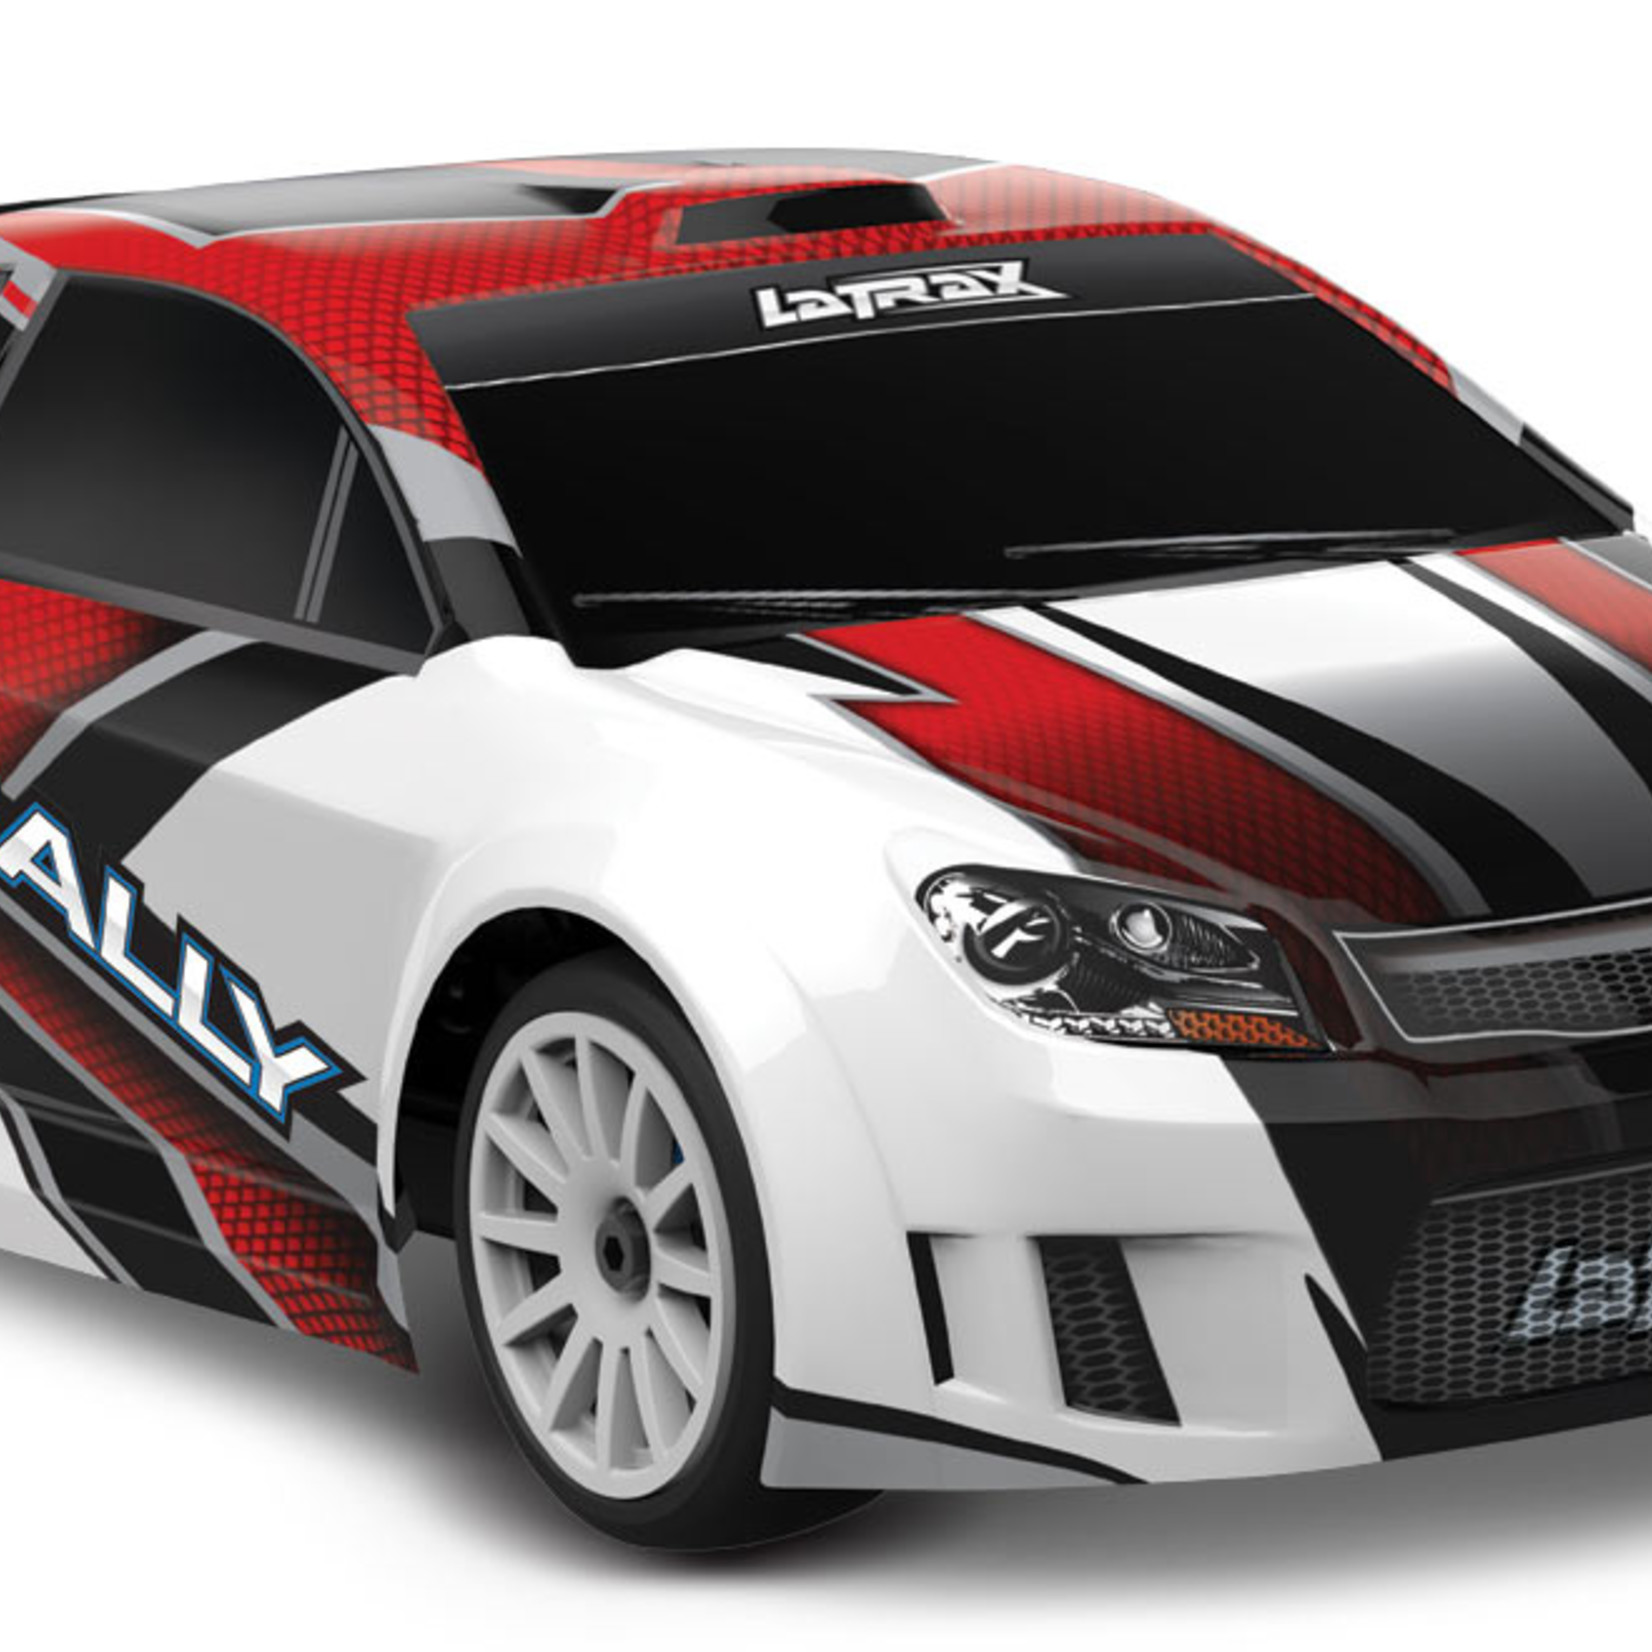 Traxxas TRA75054-5 LaTrax Rally: 1/18 Scale 4WD Electric